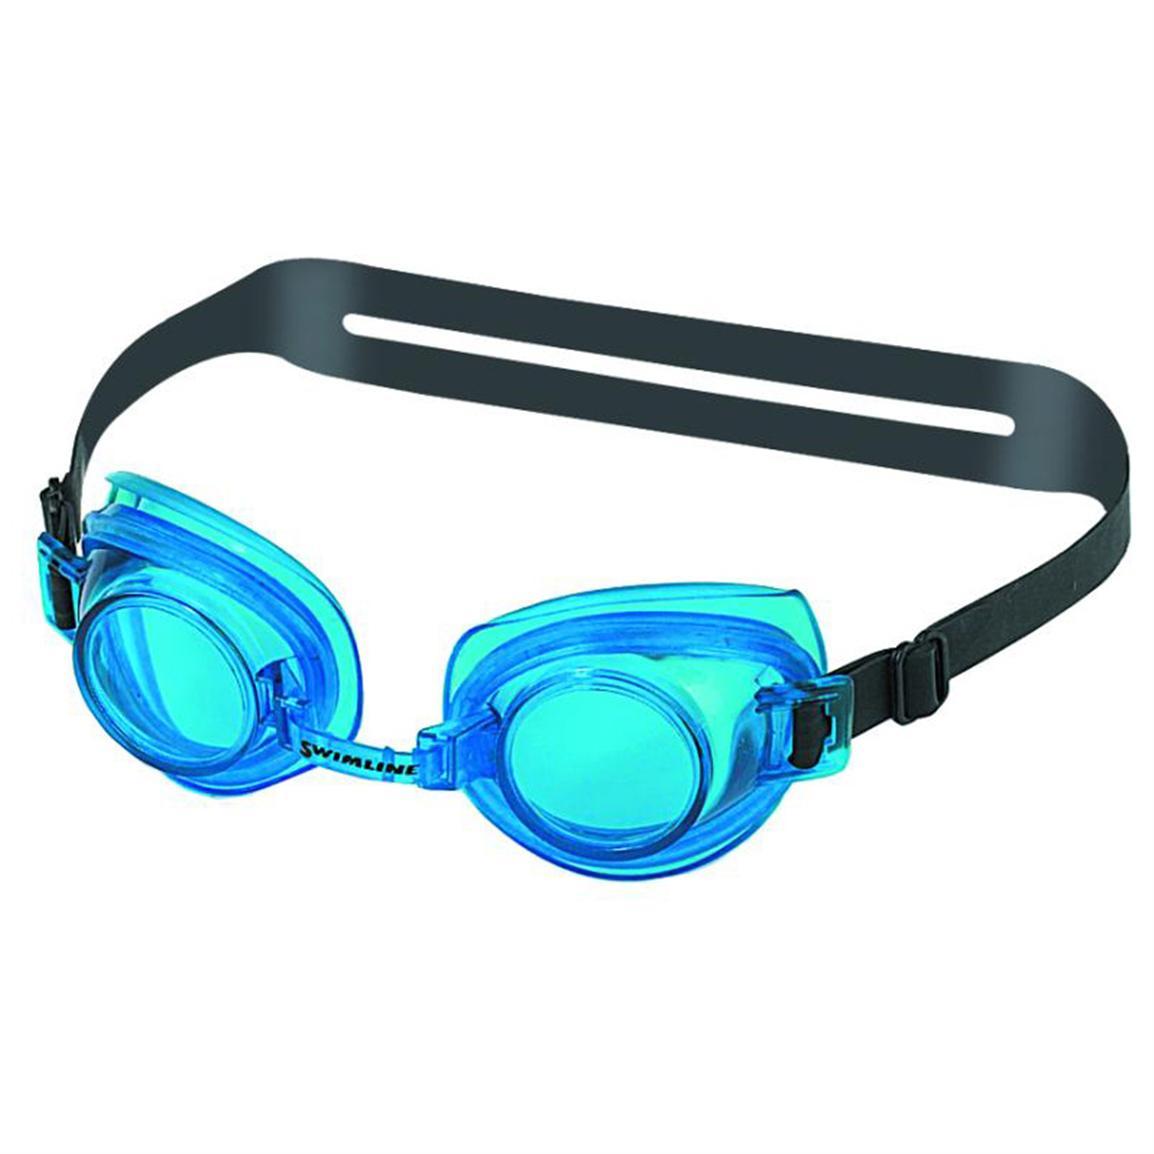 Goggles clipart Panda Clipart Goggles Images Clipart